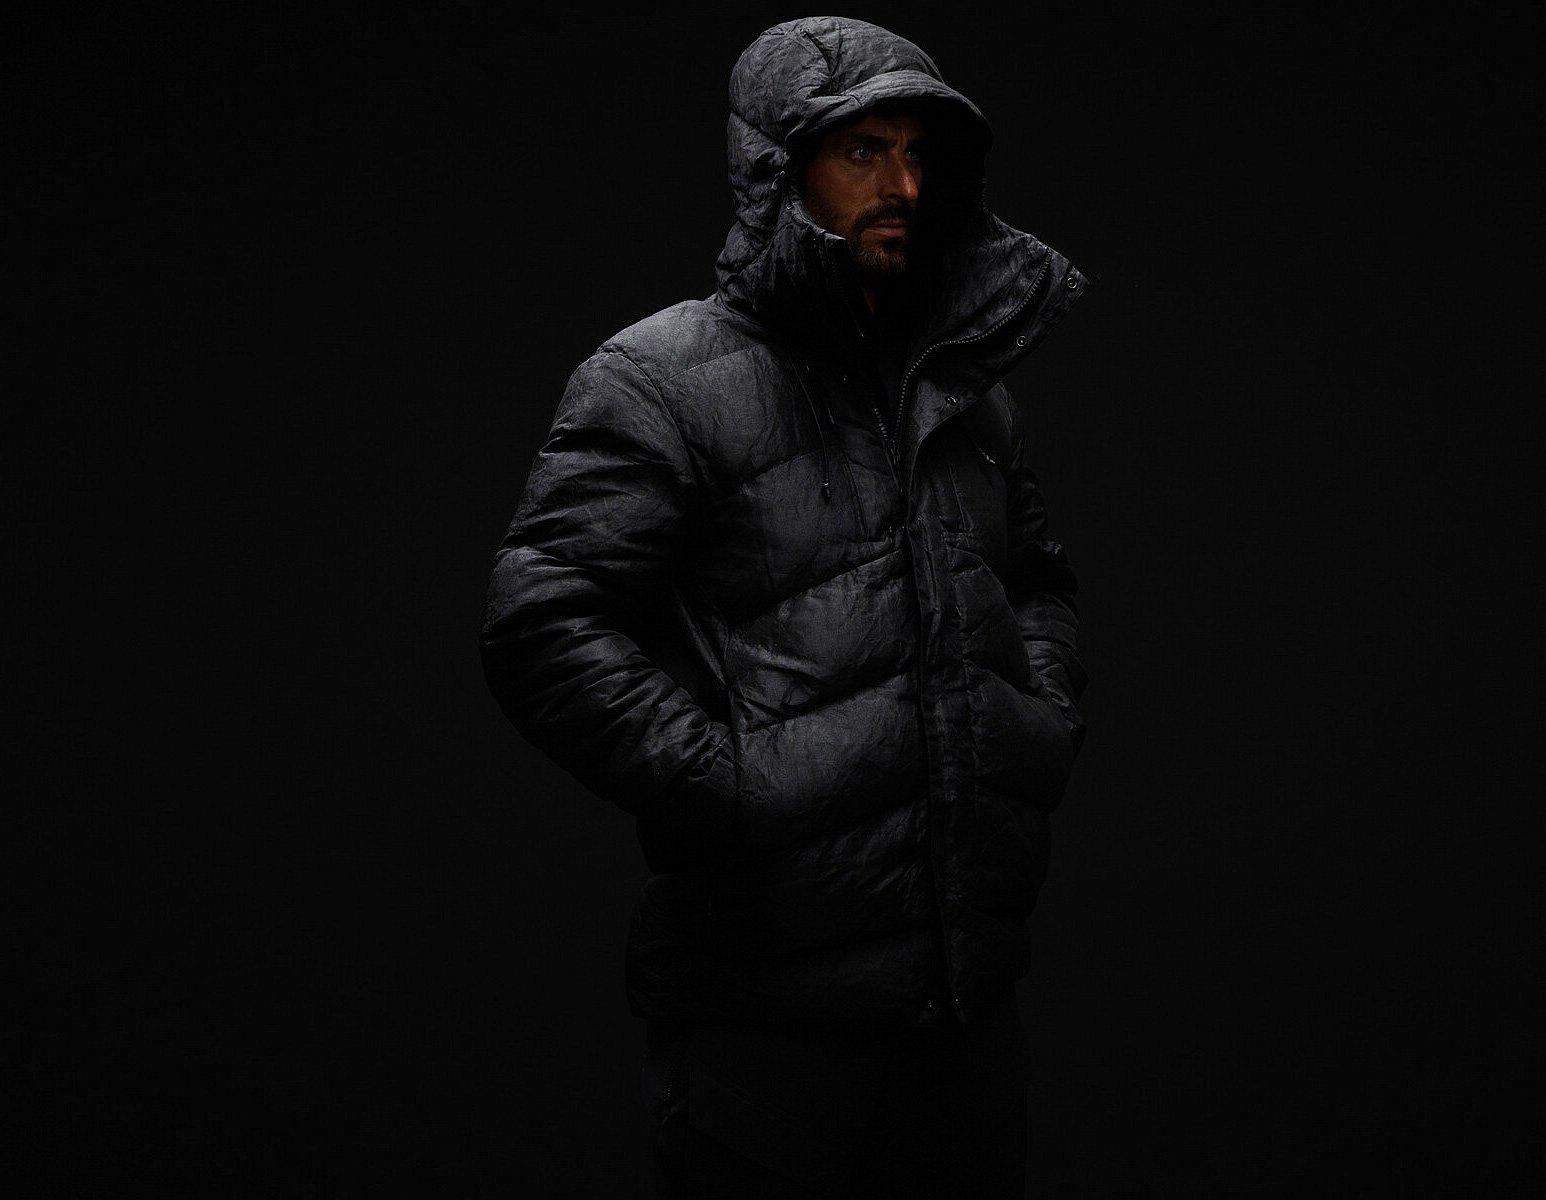 Vollebak Introduces -40º Indestructible Puffer Jacket at werd.com